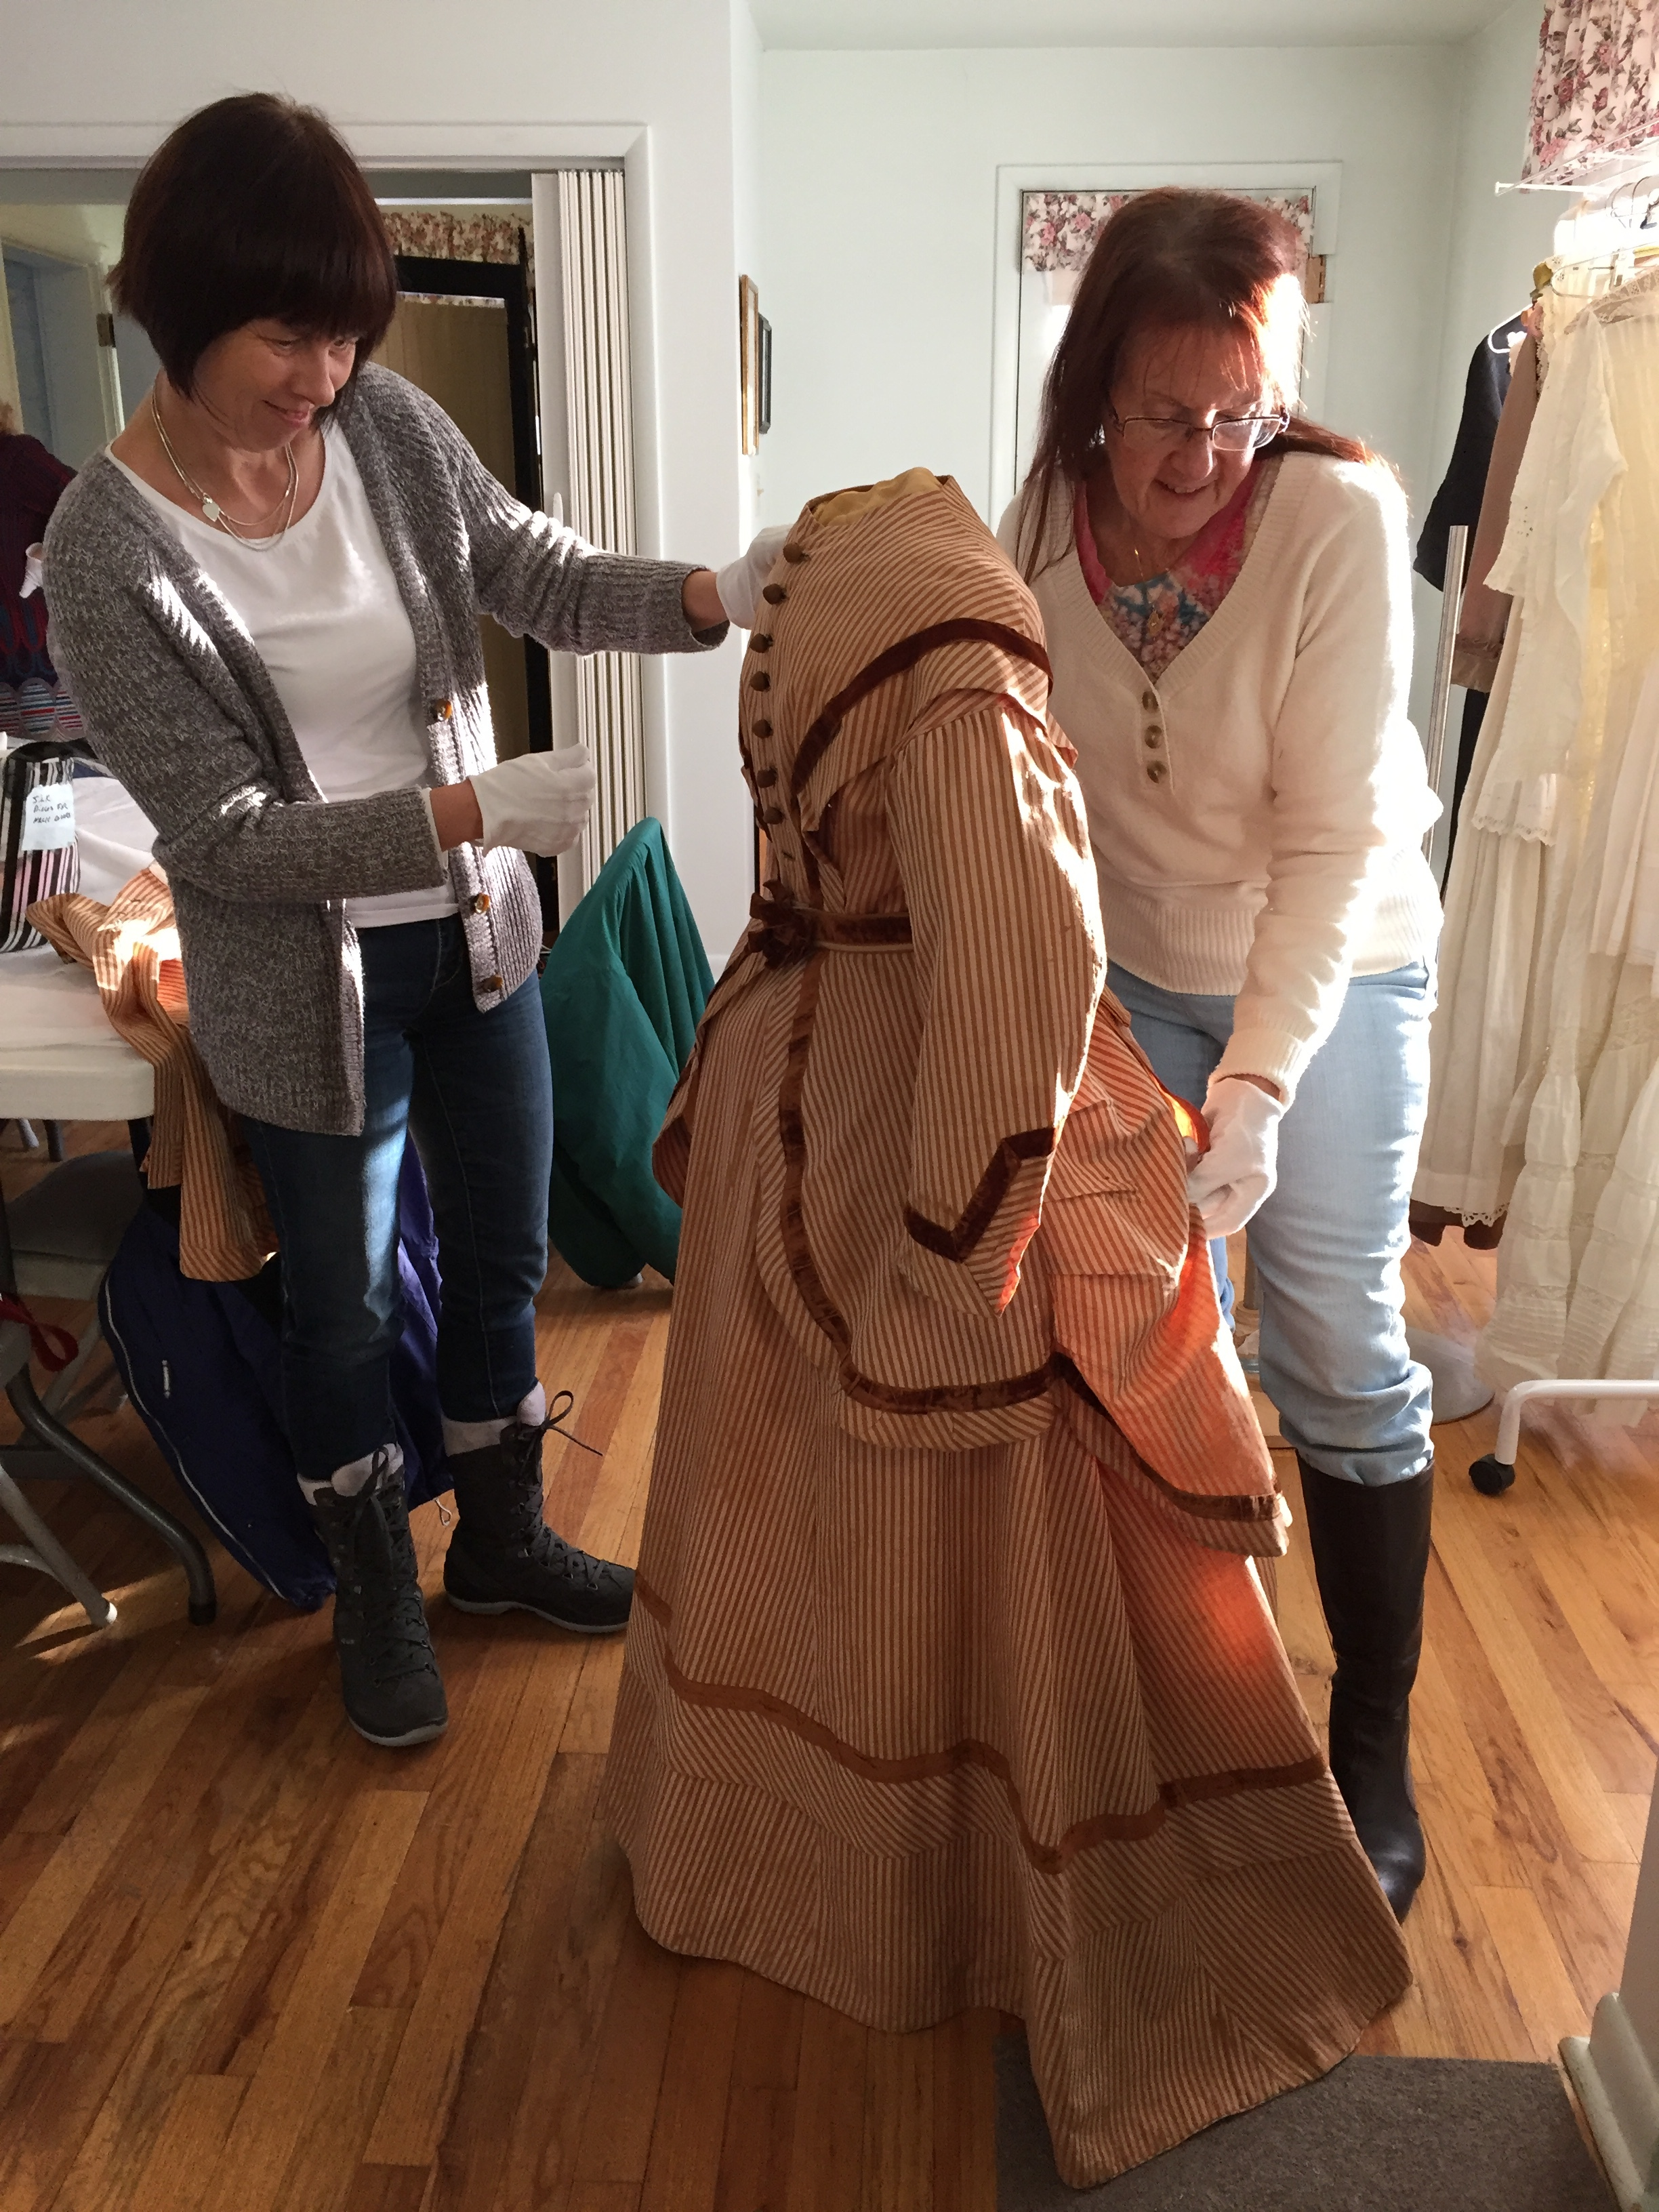 Fashion Exhibit volunteers